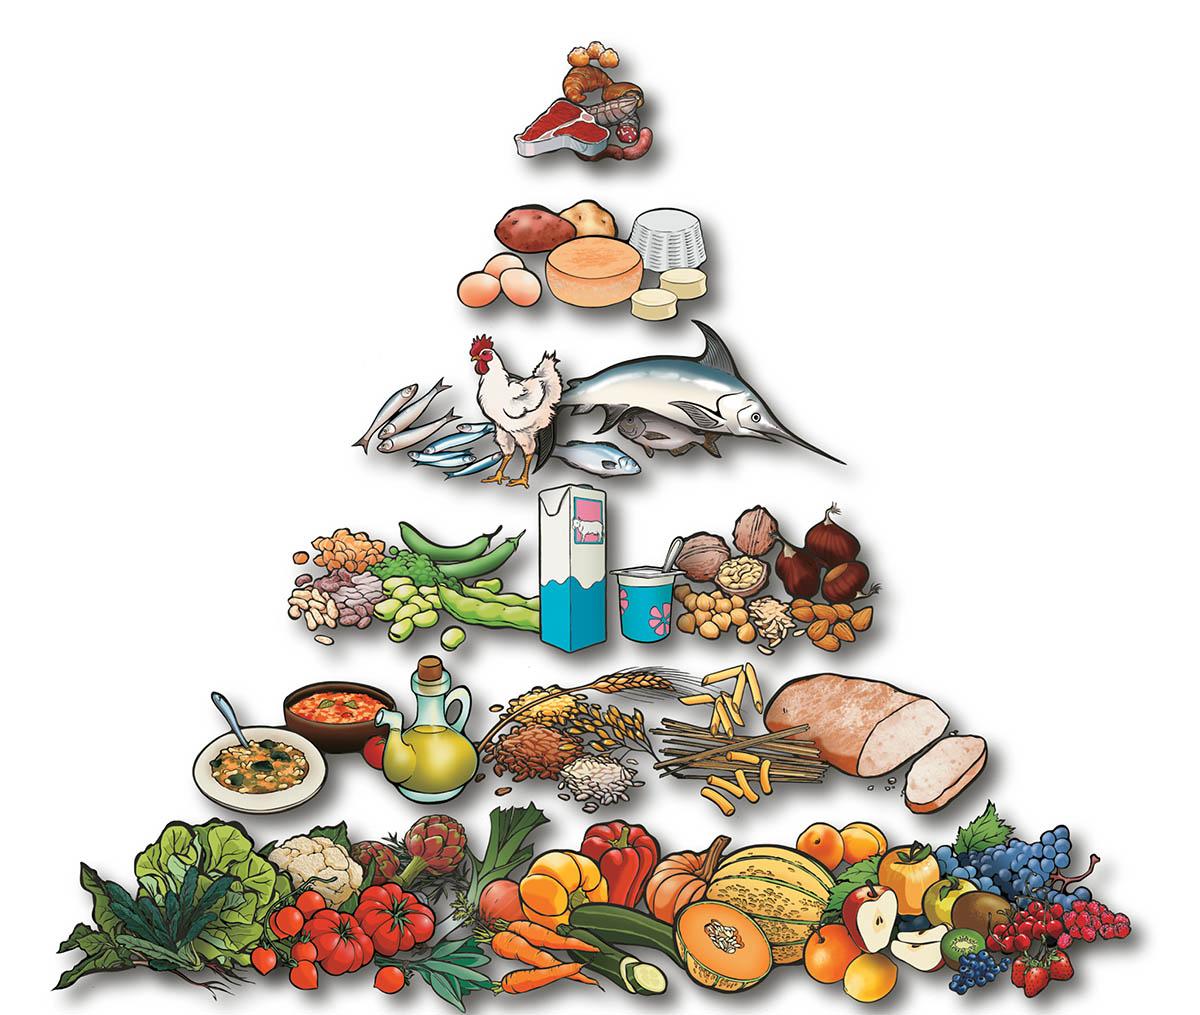 La Piramide Alimentare Toscana®